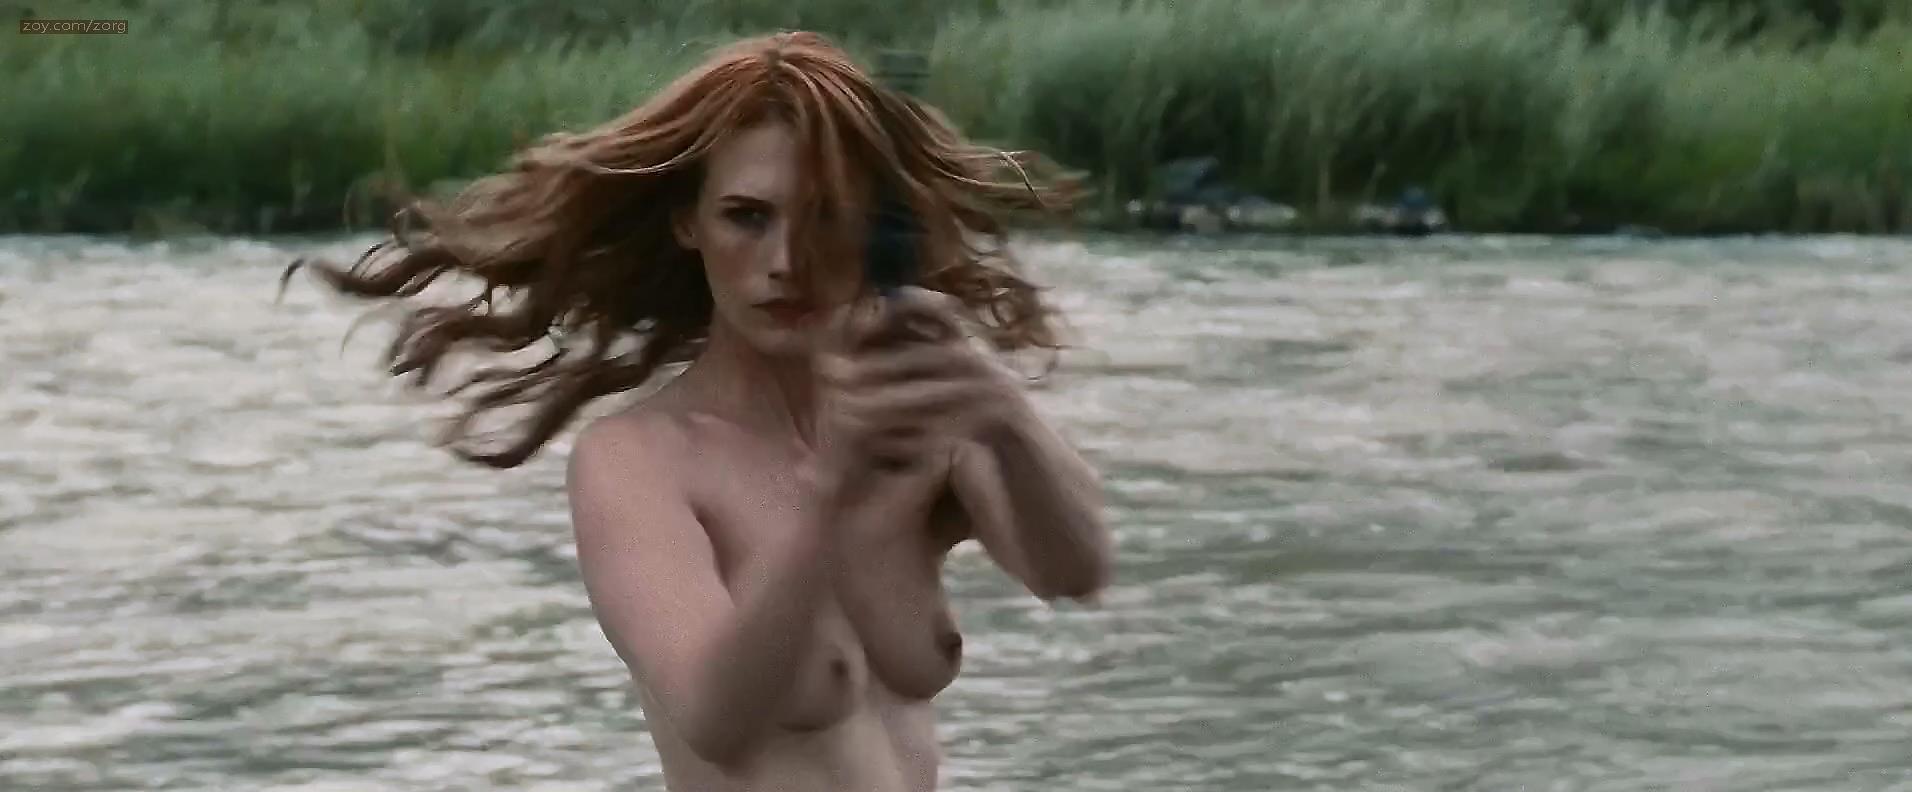 january jones naked